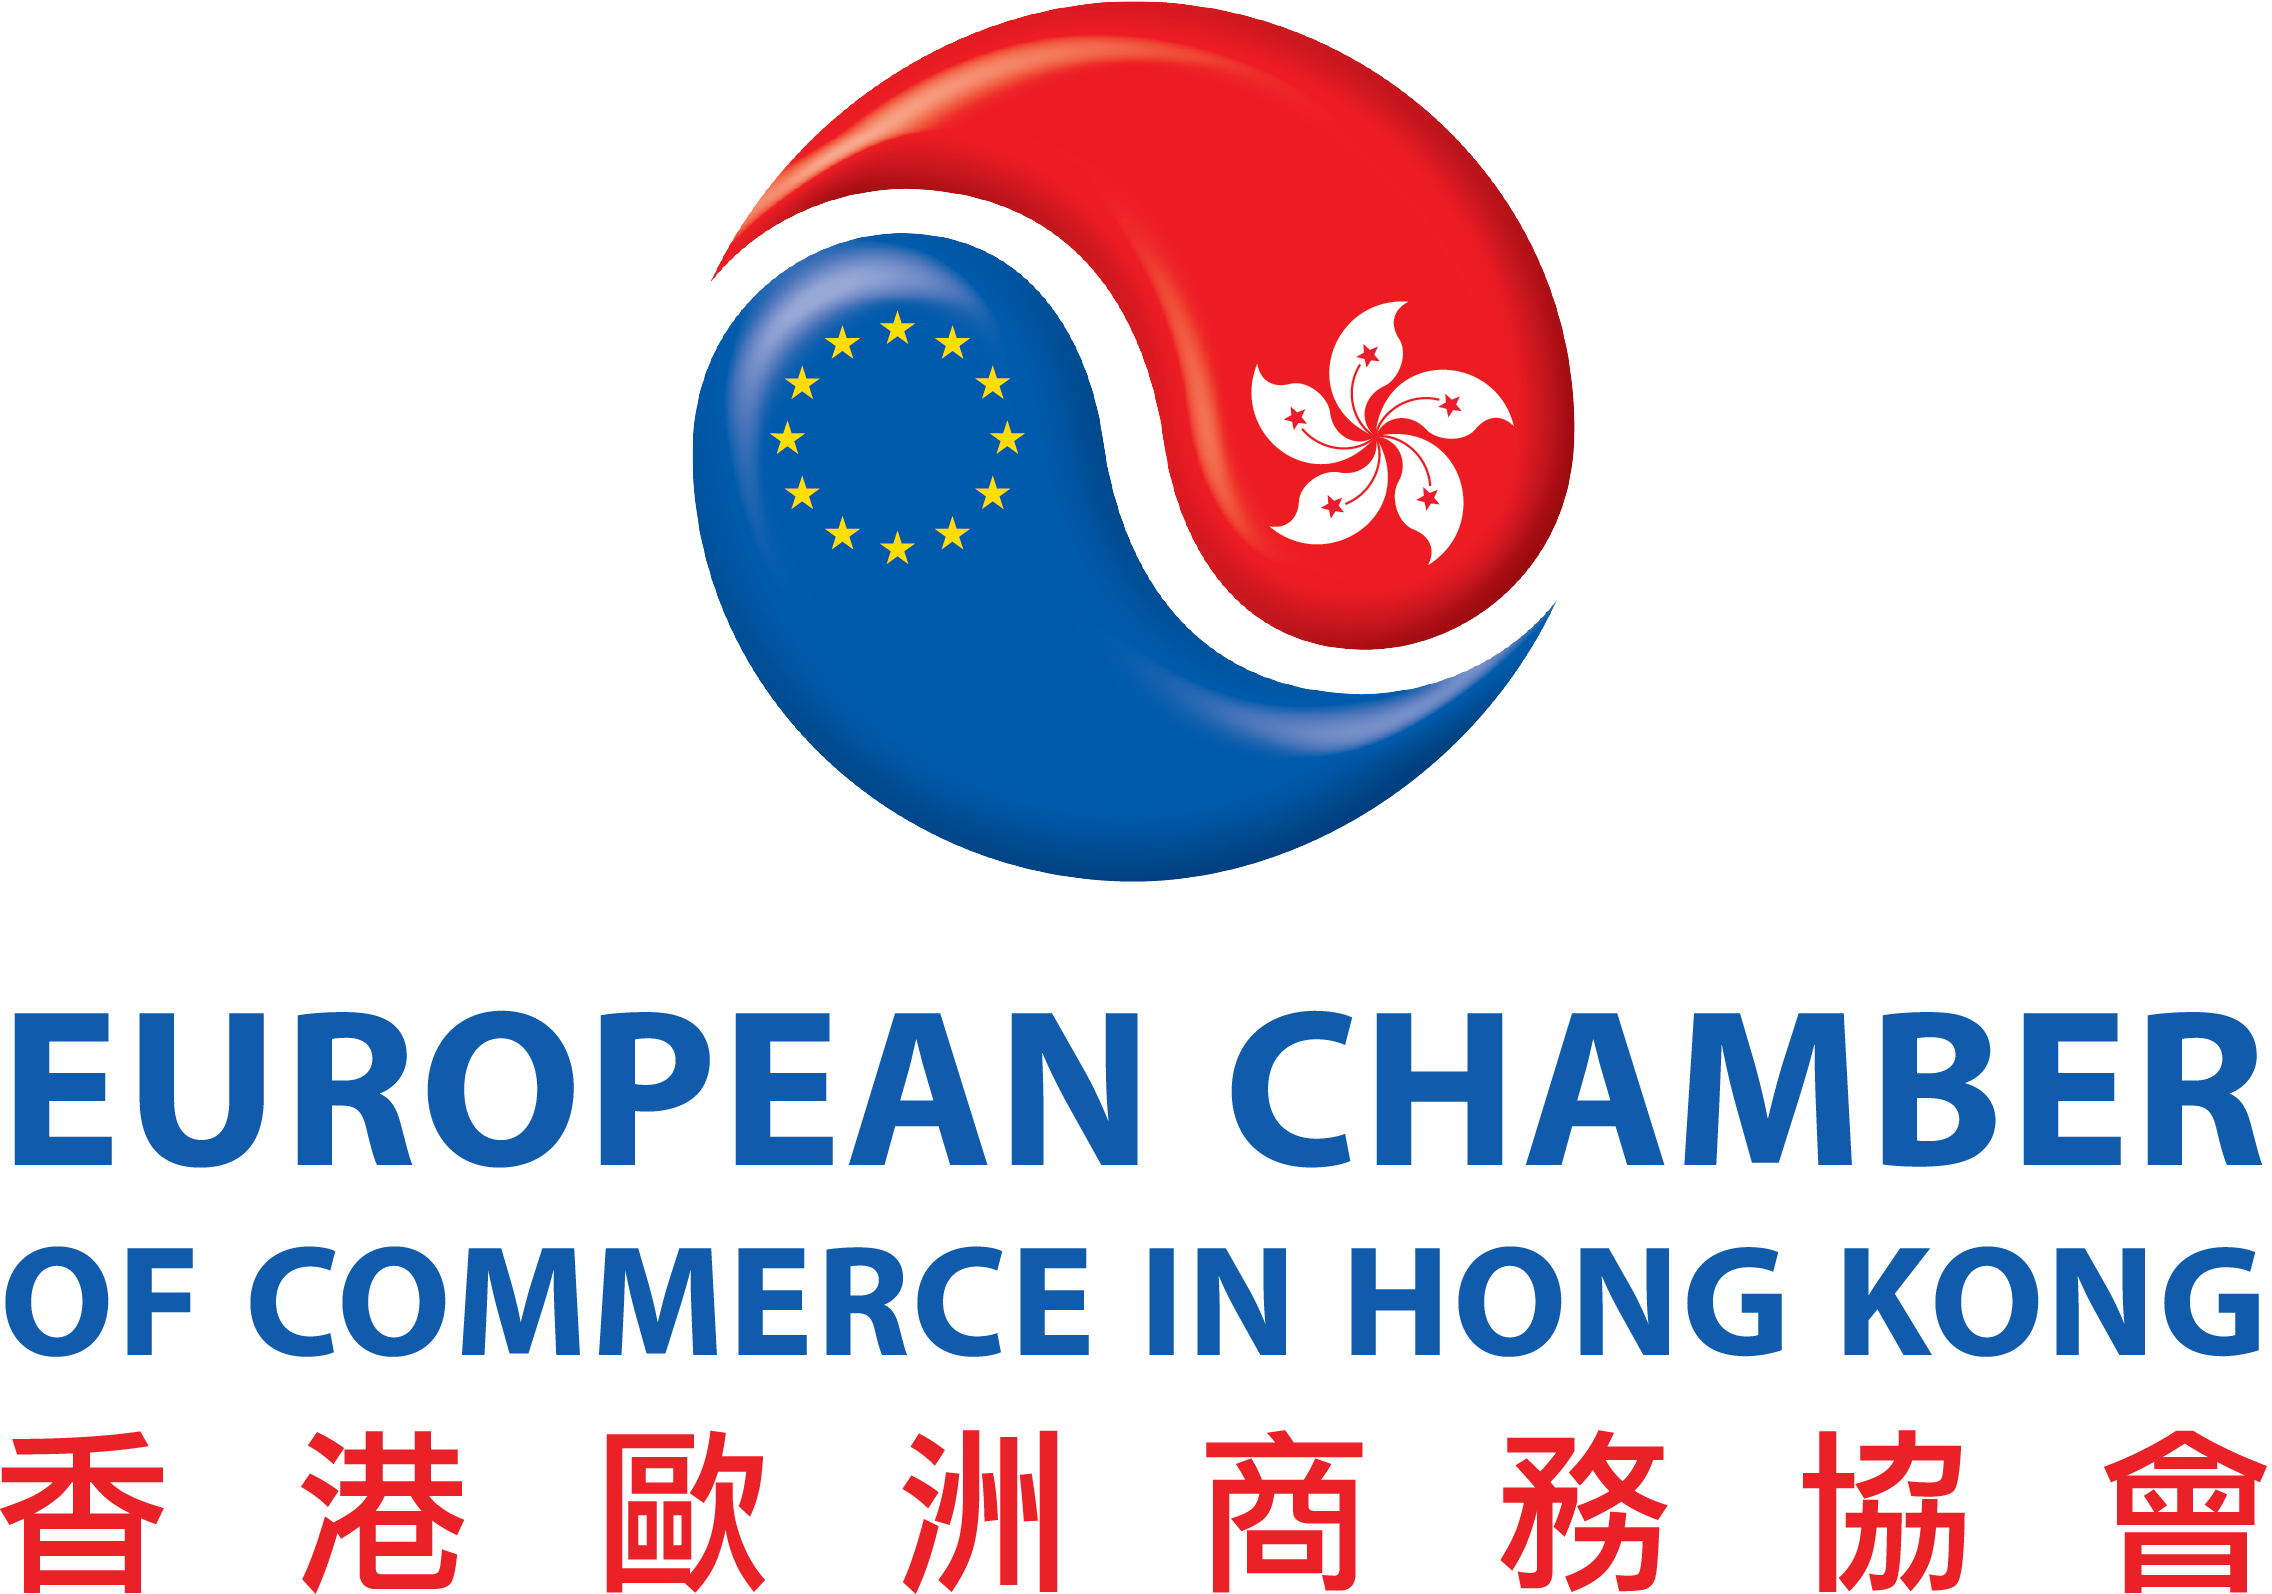 European Chamber of Commerce in Hong Kong